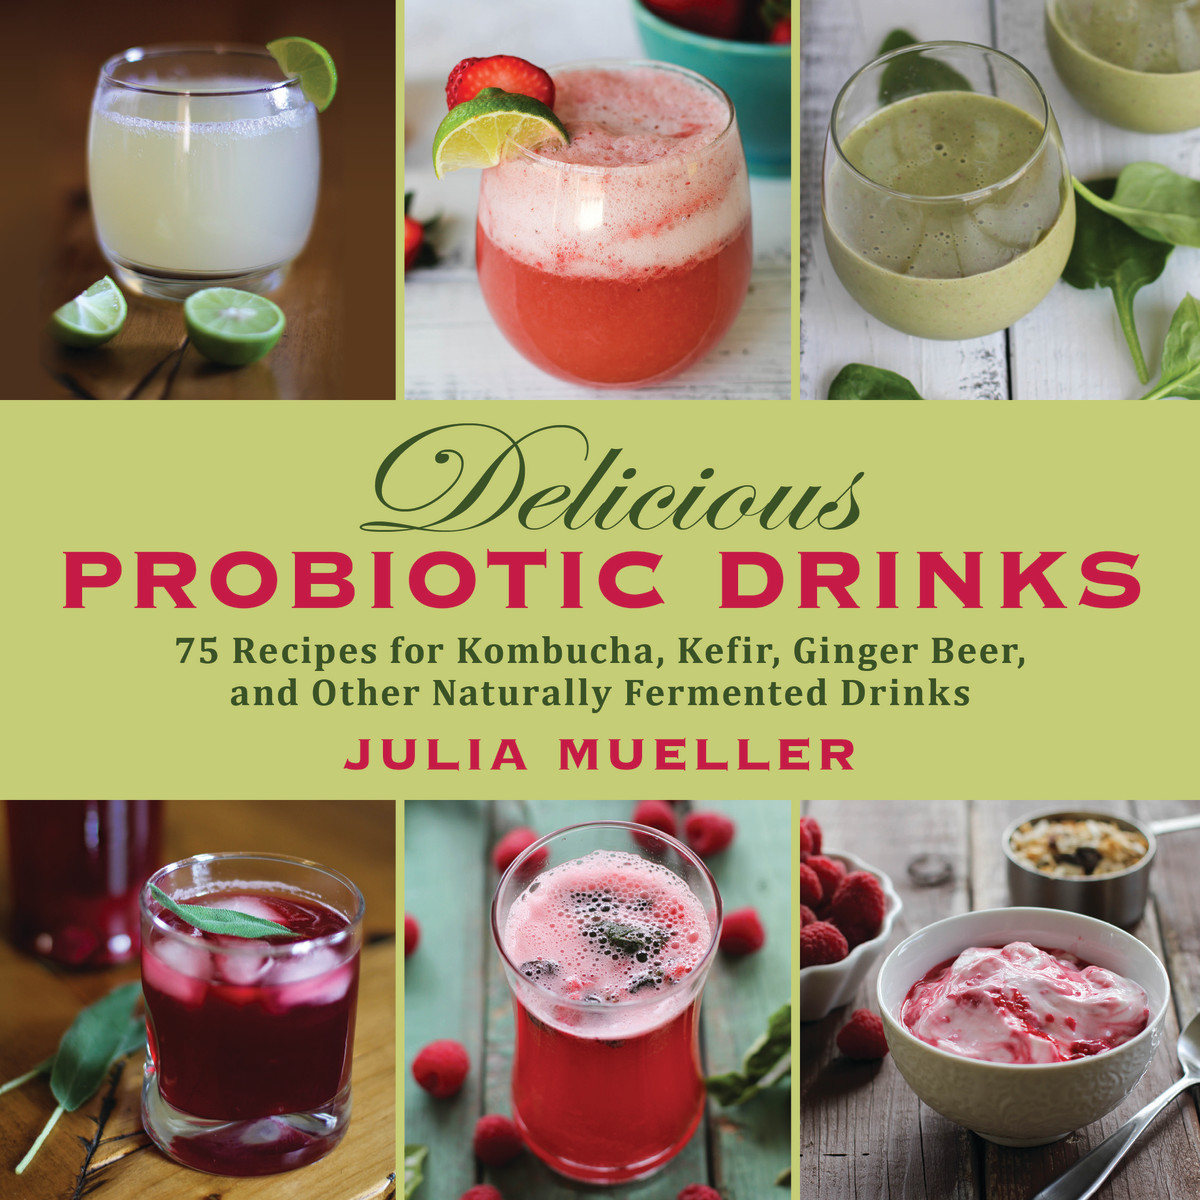 Delicious Probiotic Drinks by Julia Mueller